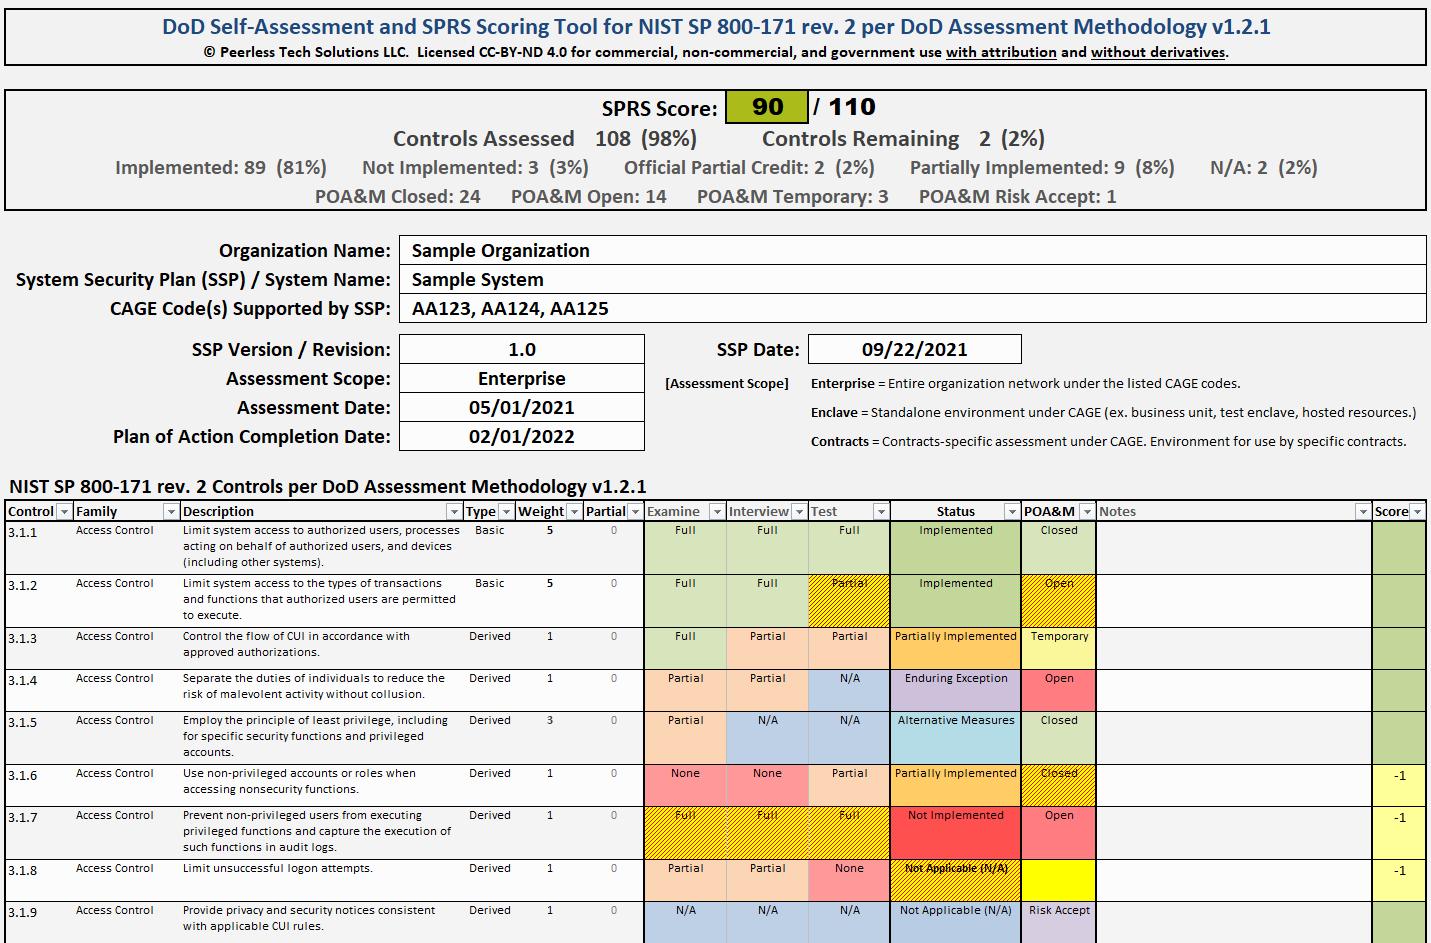 Peerless - DoD Self-Assessment and SPRS Score v1.2.1d_SAMPLE_20210922-2